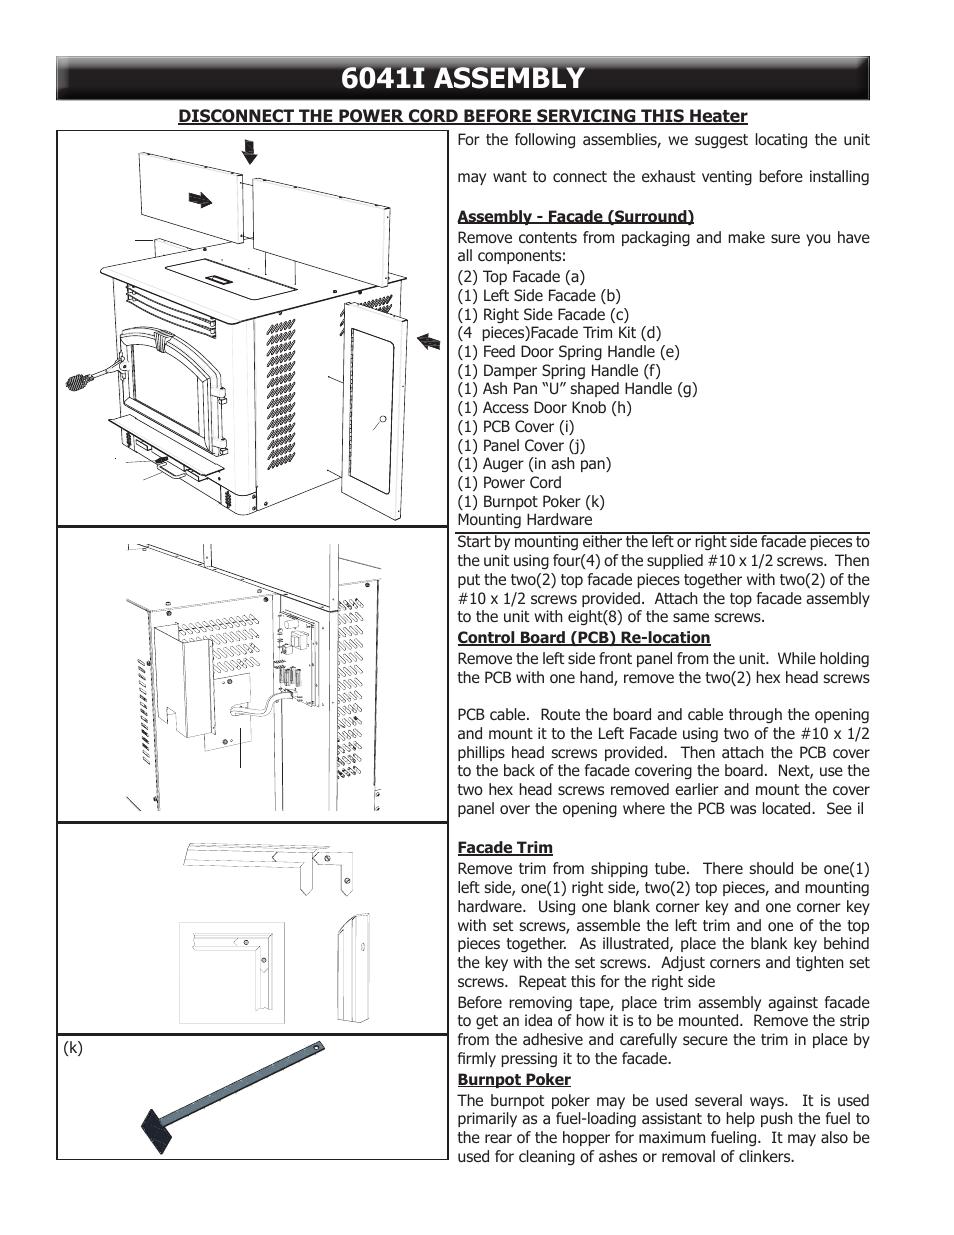 6041i assembly, A) (c) (h) (f) (g) (b) (e), I) (j